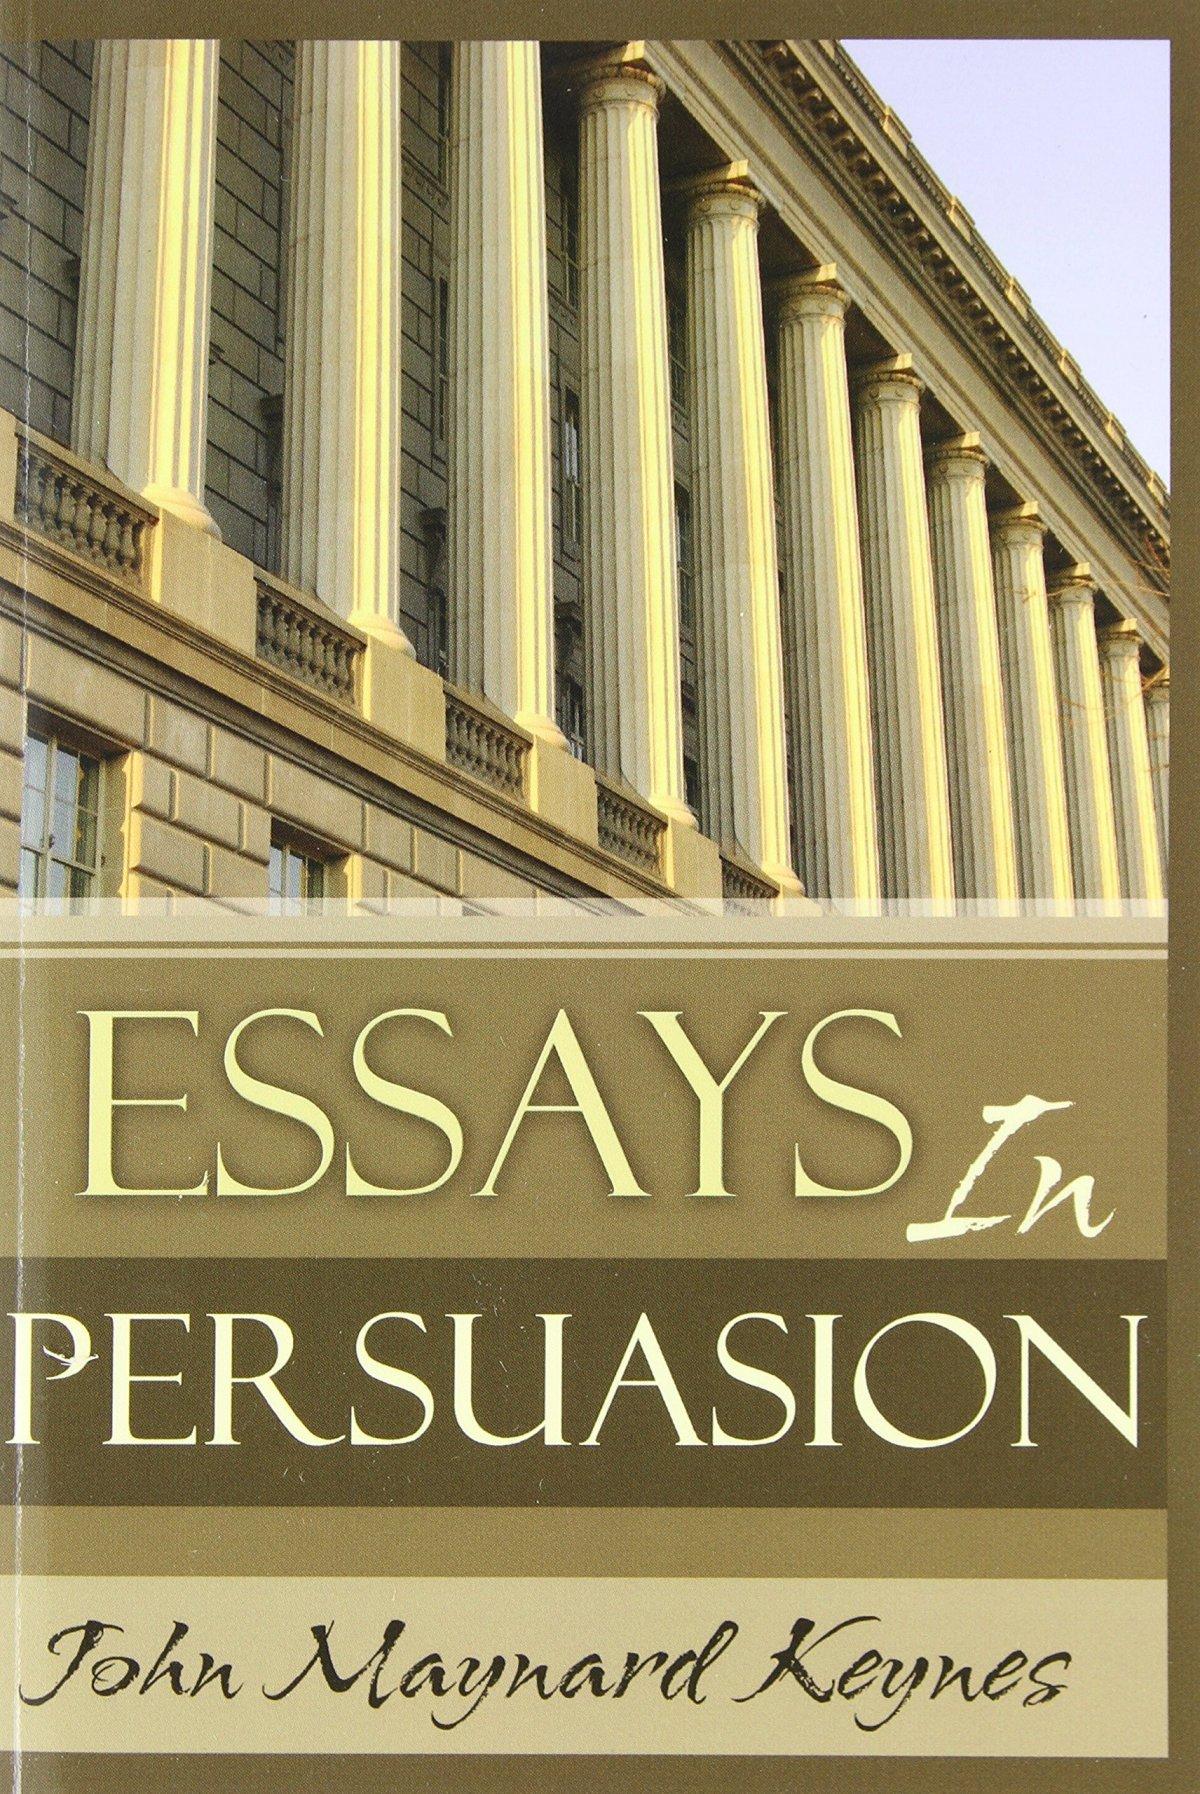 009 Essays In Persuasion By John Maynard Keynes Essay Remarkable Audiobook Pdf Summary Full